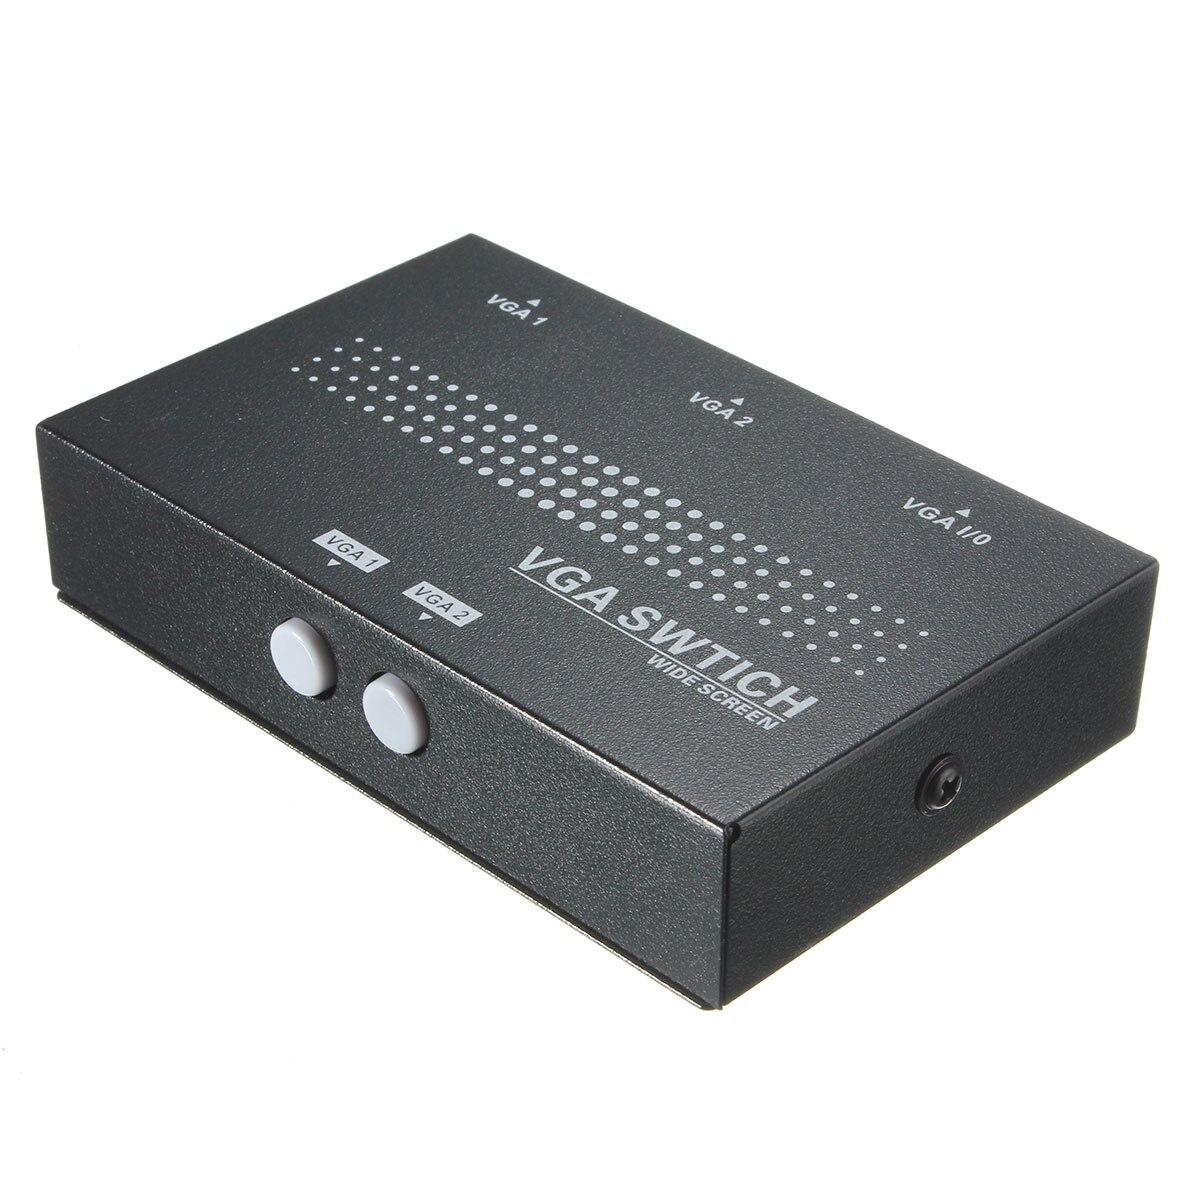 Nachdenklich Original Universal 2 Port Hub Usb 2.0 Kvm Svga Vga Switch Box Monitor Adapter Verbindet Drucker Intelli Tastatur Maus Sharing Hc Computer & Büro